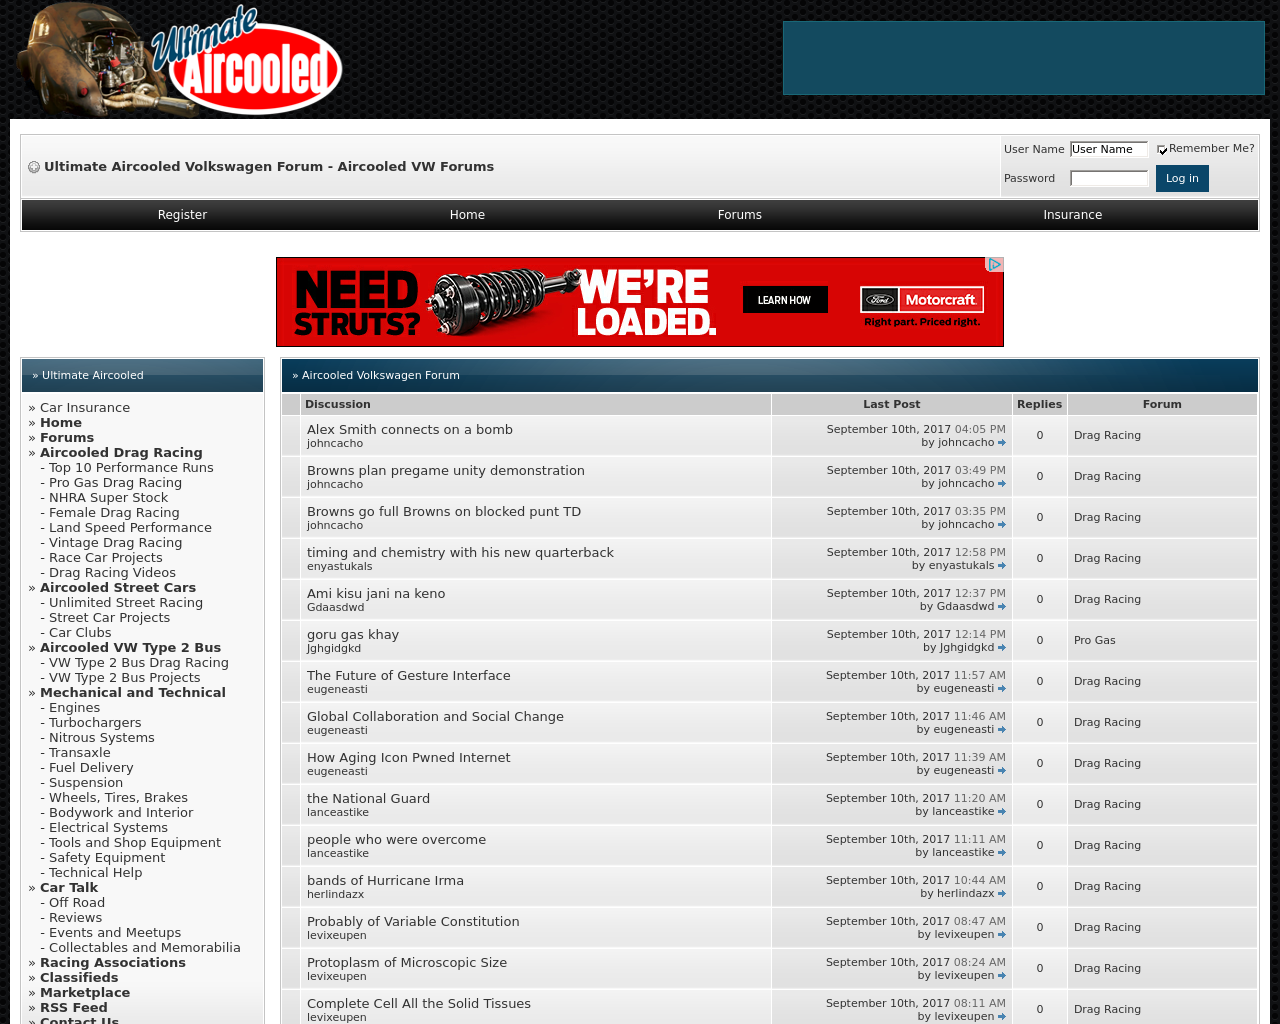 Ultimate-Aircooled-Volkswagen-Forum-Advertising-Reviews-Pricing